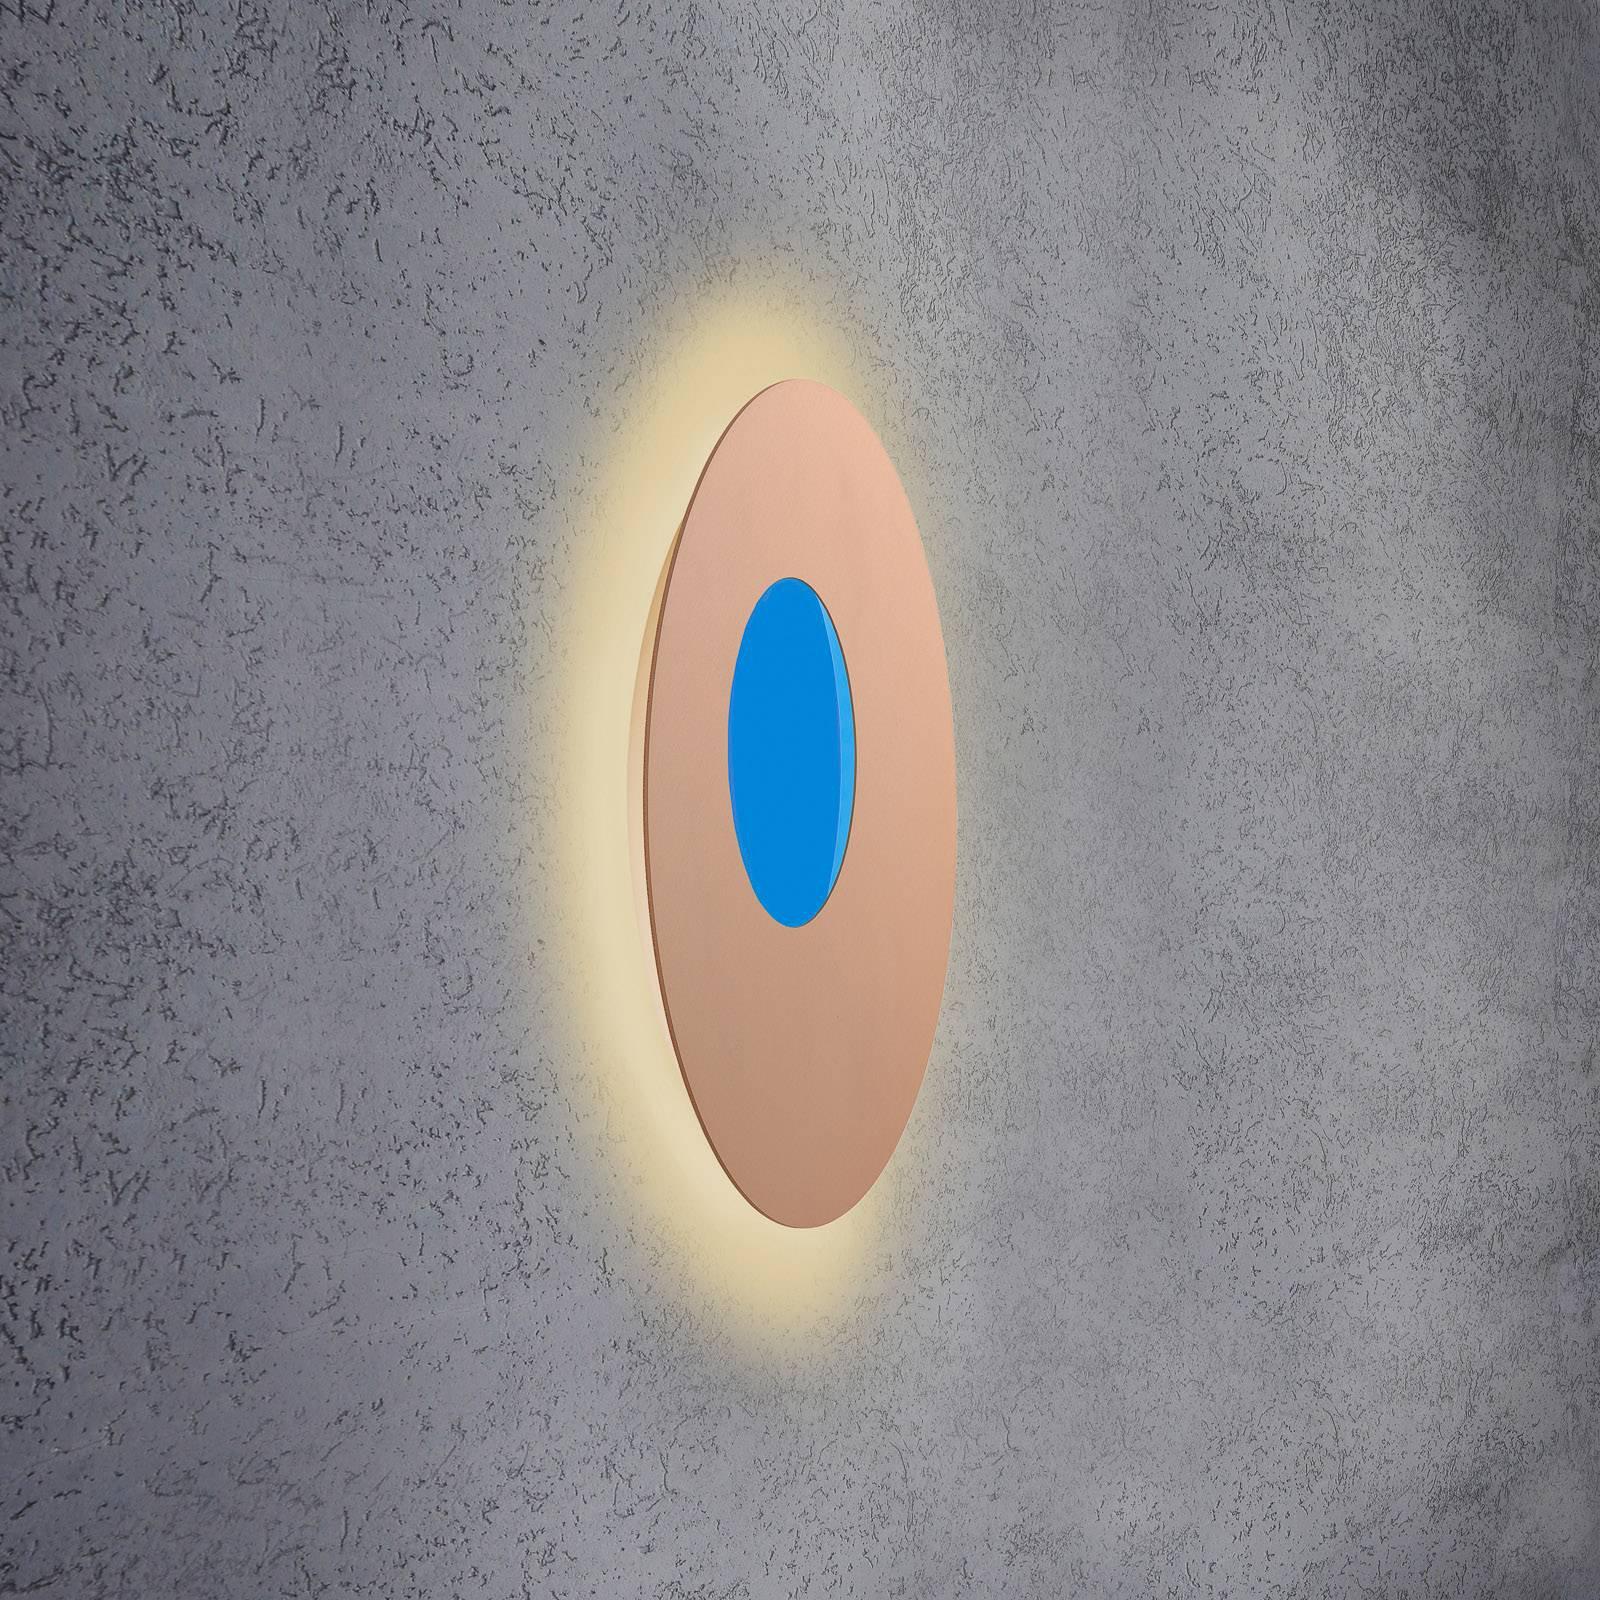 Escale Blade Open LED-vegglampe RGB+W, rosé, Ø59cm